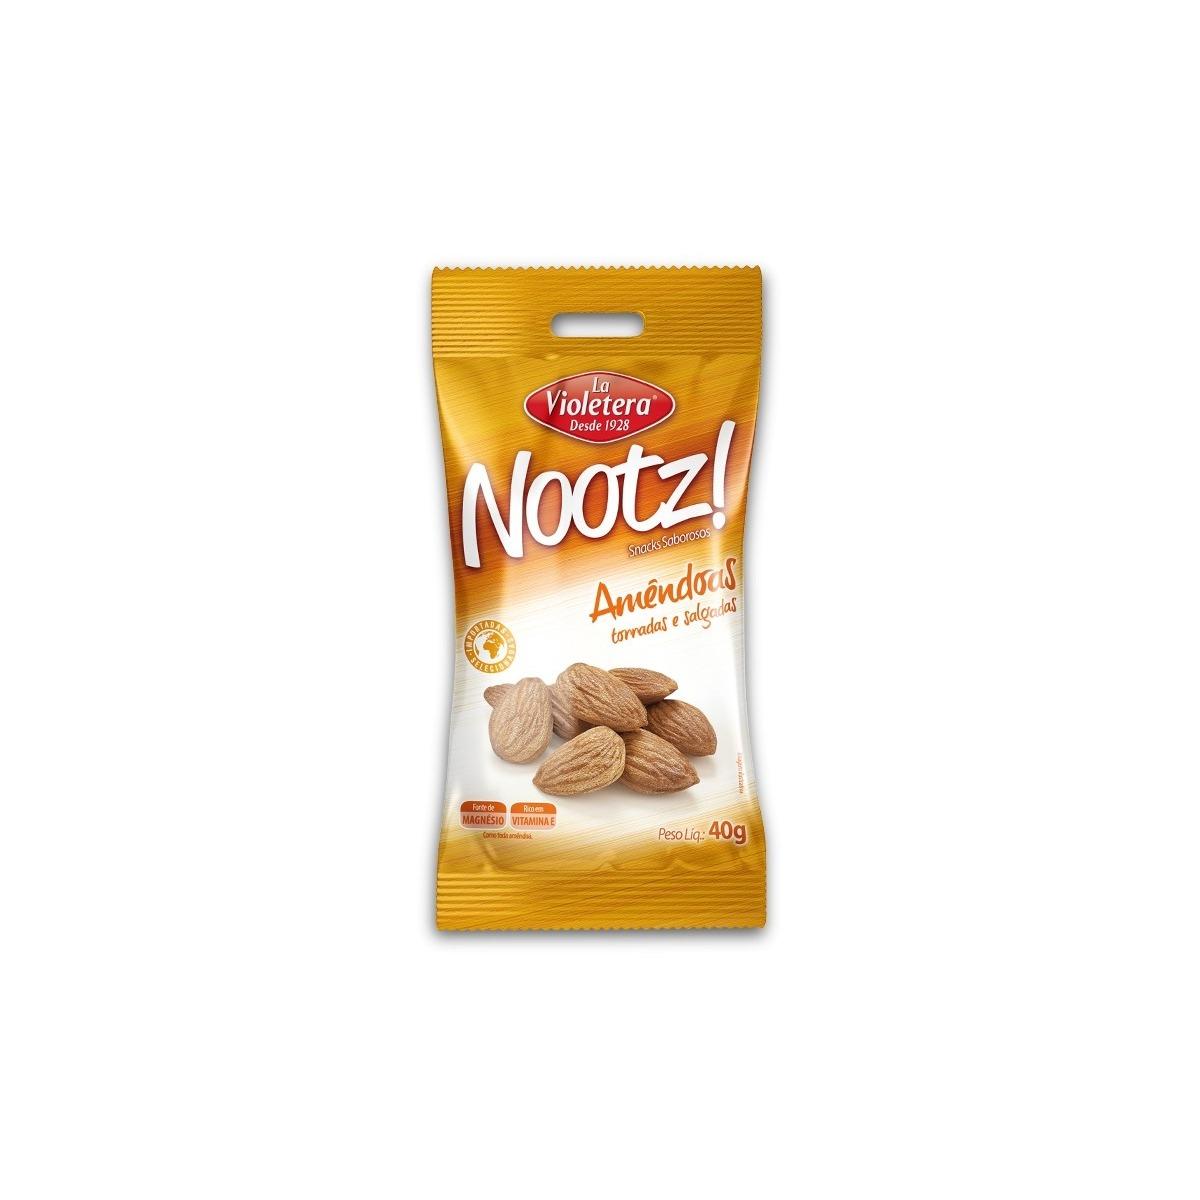 Nootz Amendoa Torrada/Salgada La Violetera Pacote 40G